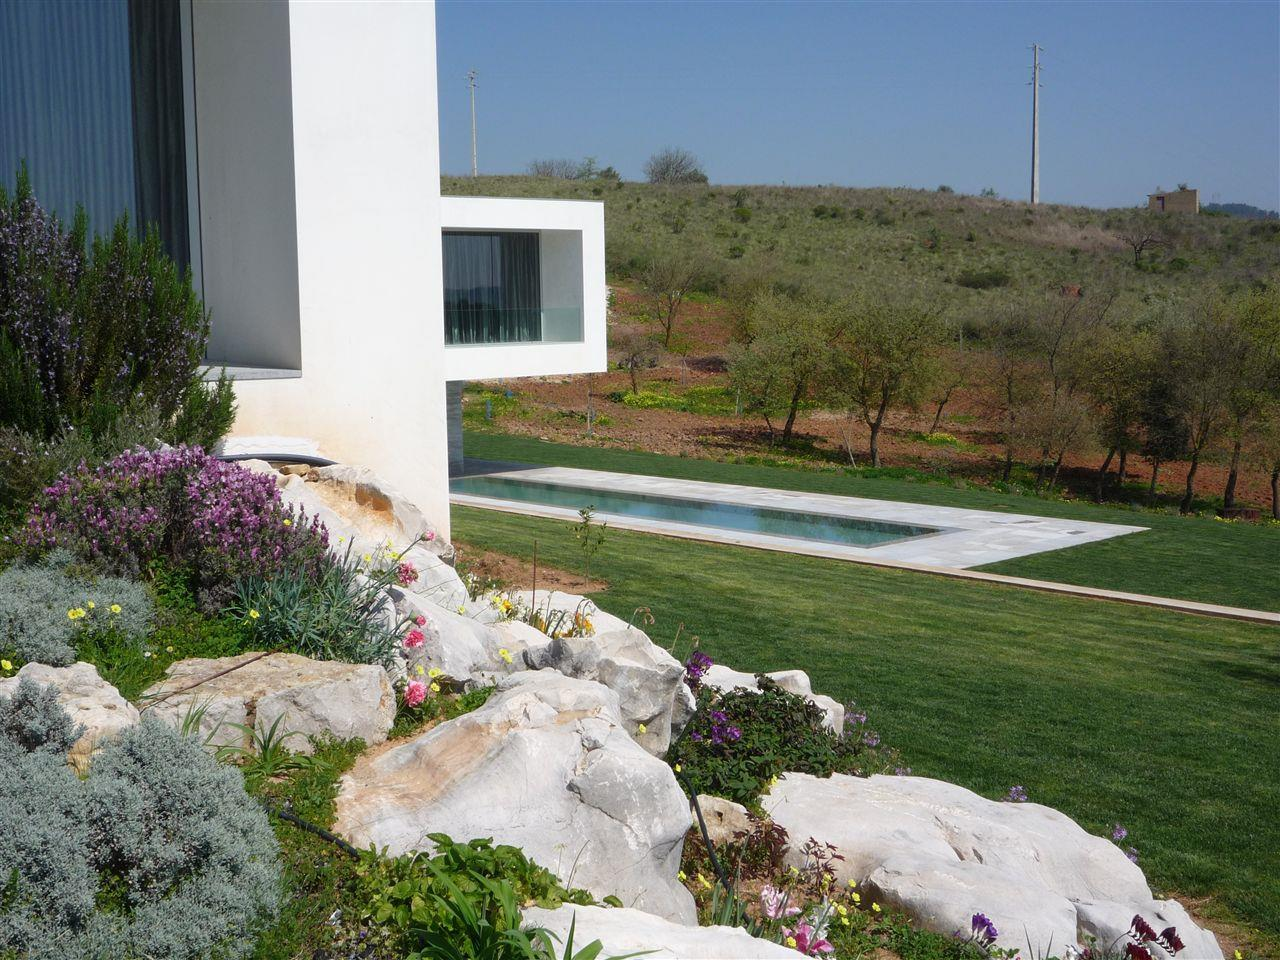 独户住宅 为 销售 在 House, 6 bedrooms, for Sale Other Portugal, 葡萄牙的其他地区 葡萄牙